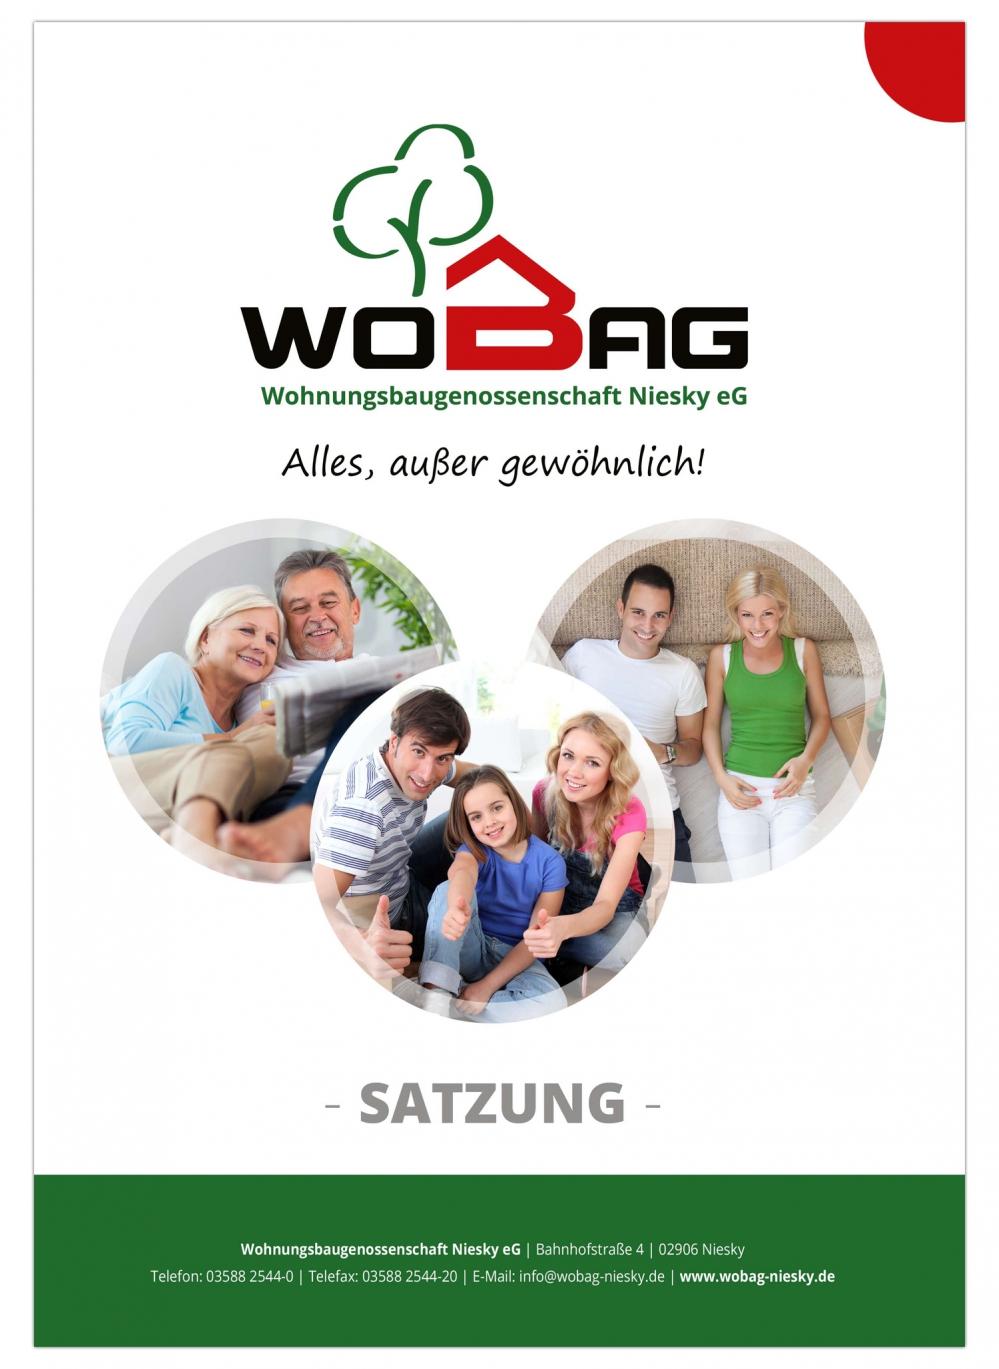 WOBAG Niesky eG - Satzung als Broschüre DIN A4 - 24-seitig